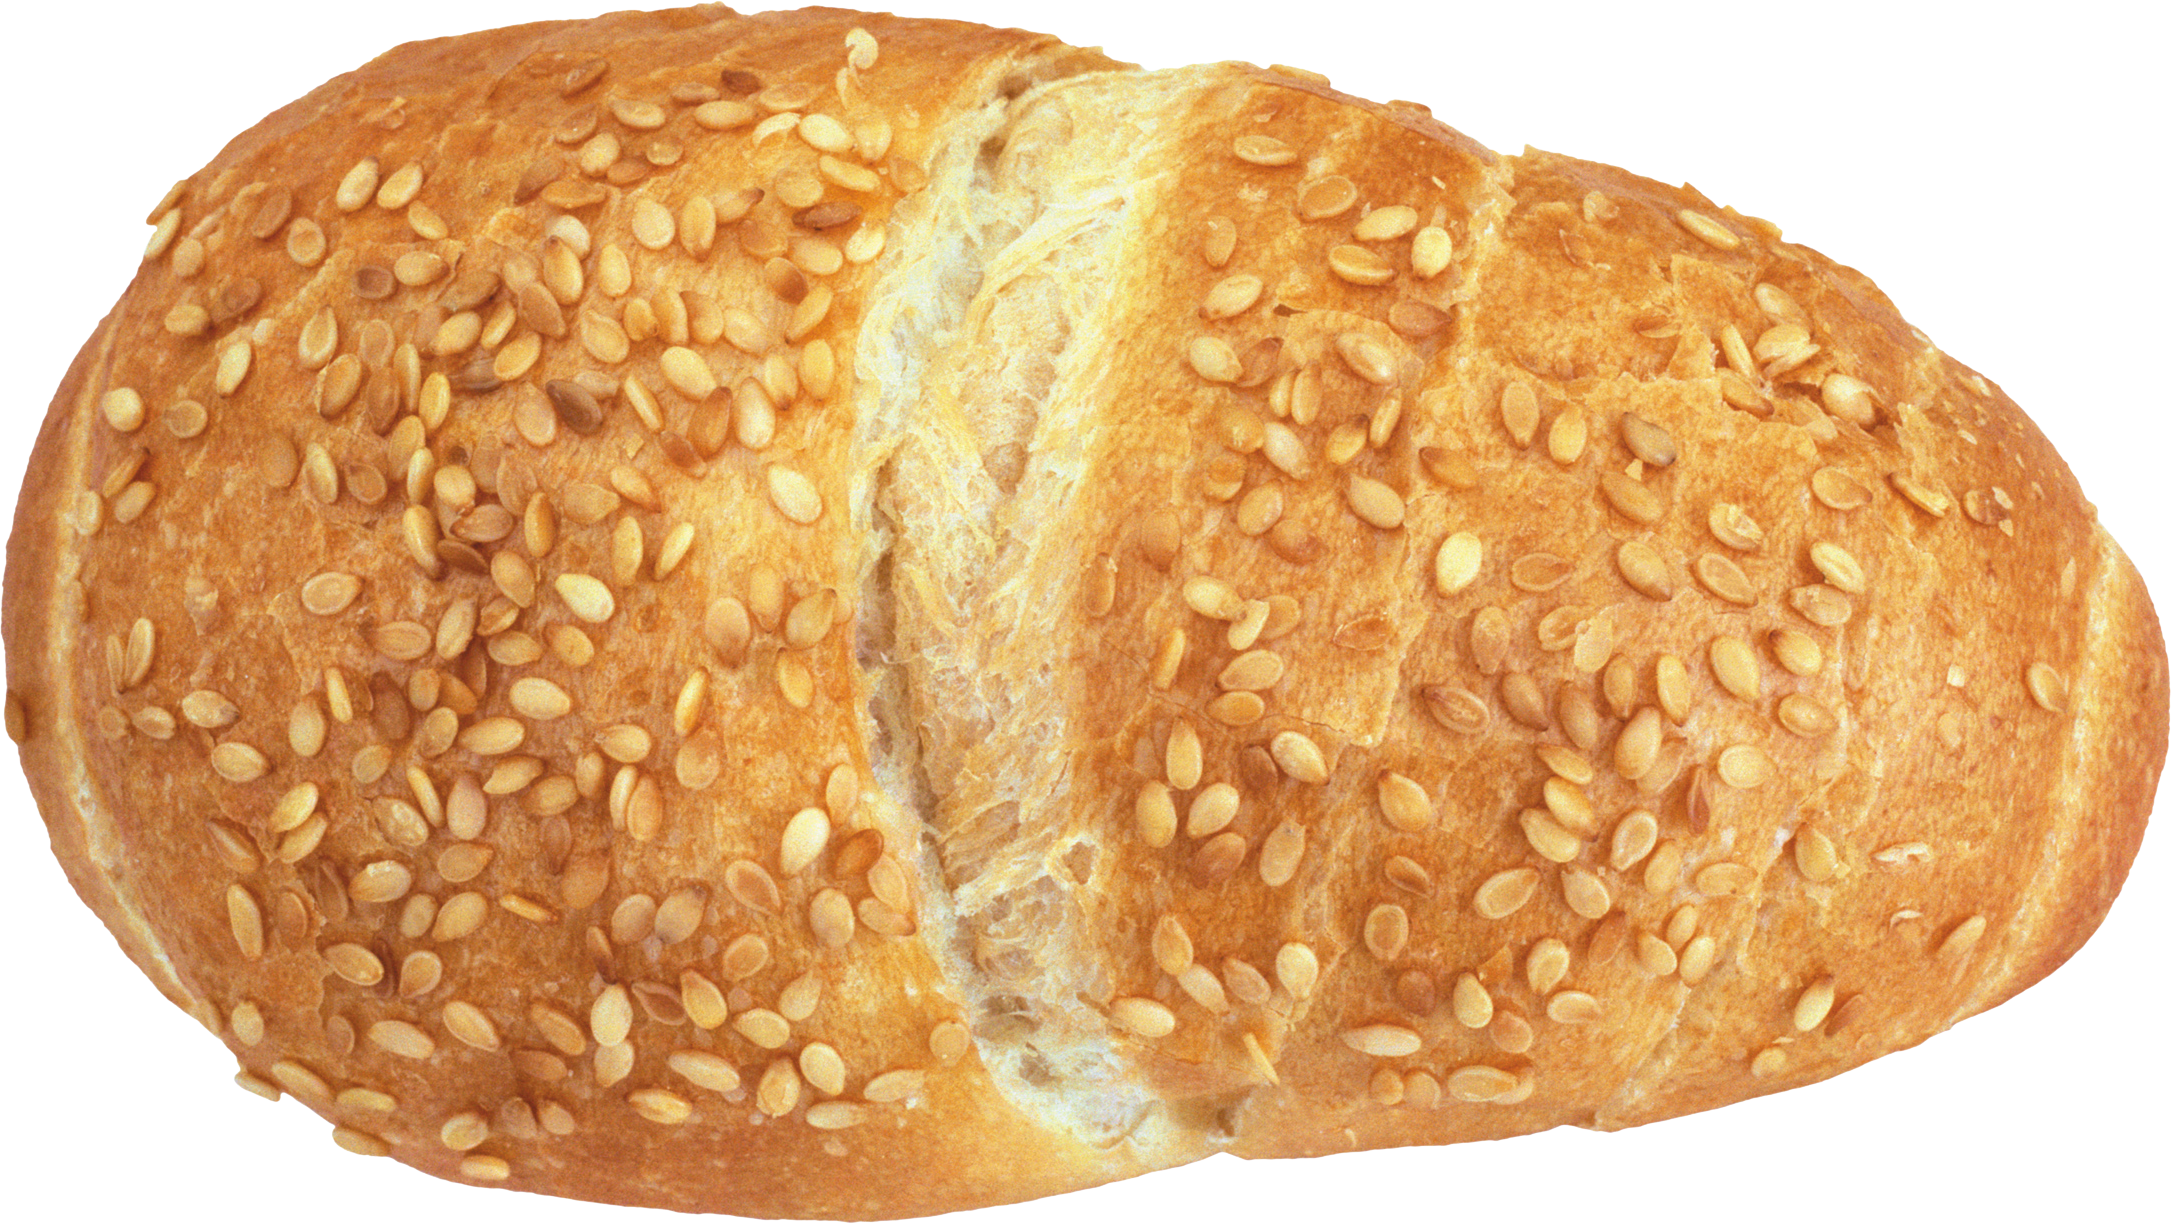 France clipart sourdough bread. Icon web icons png